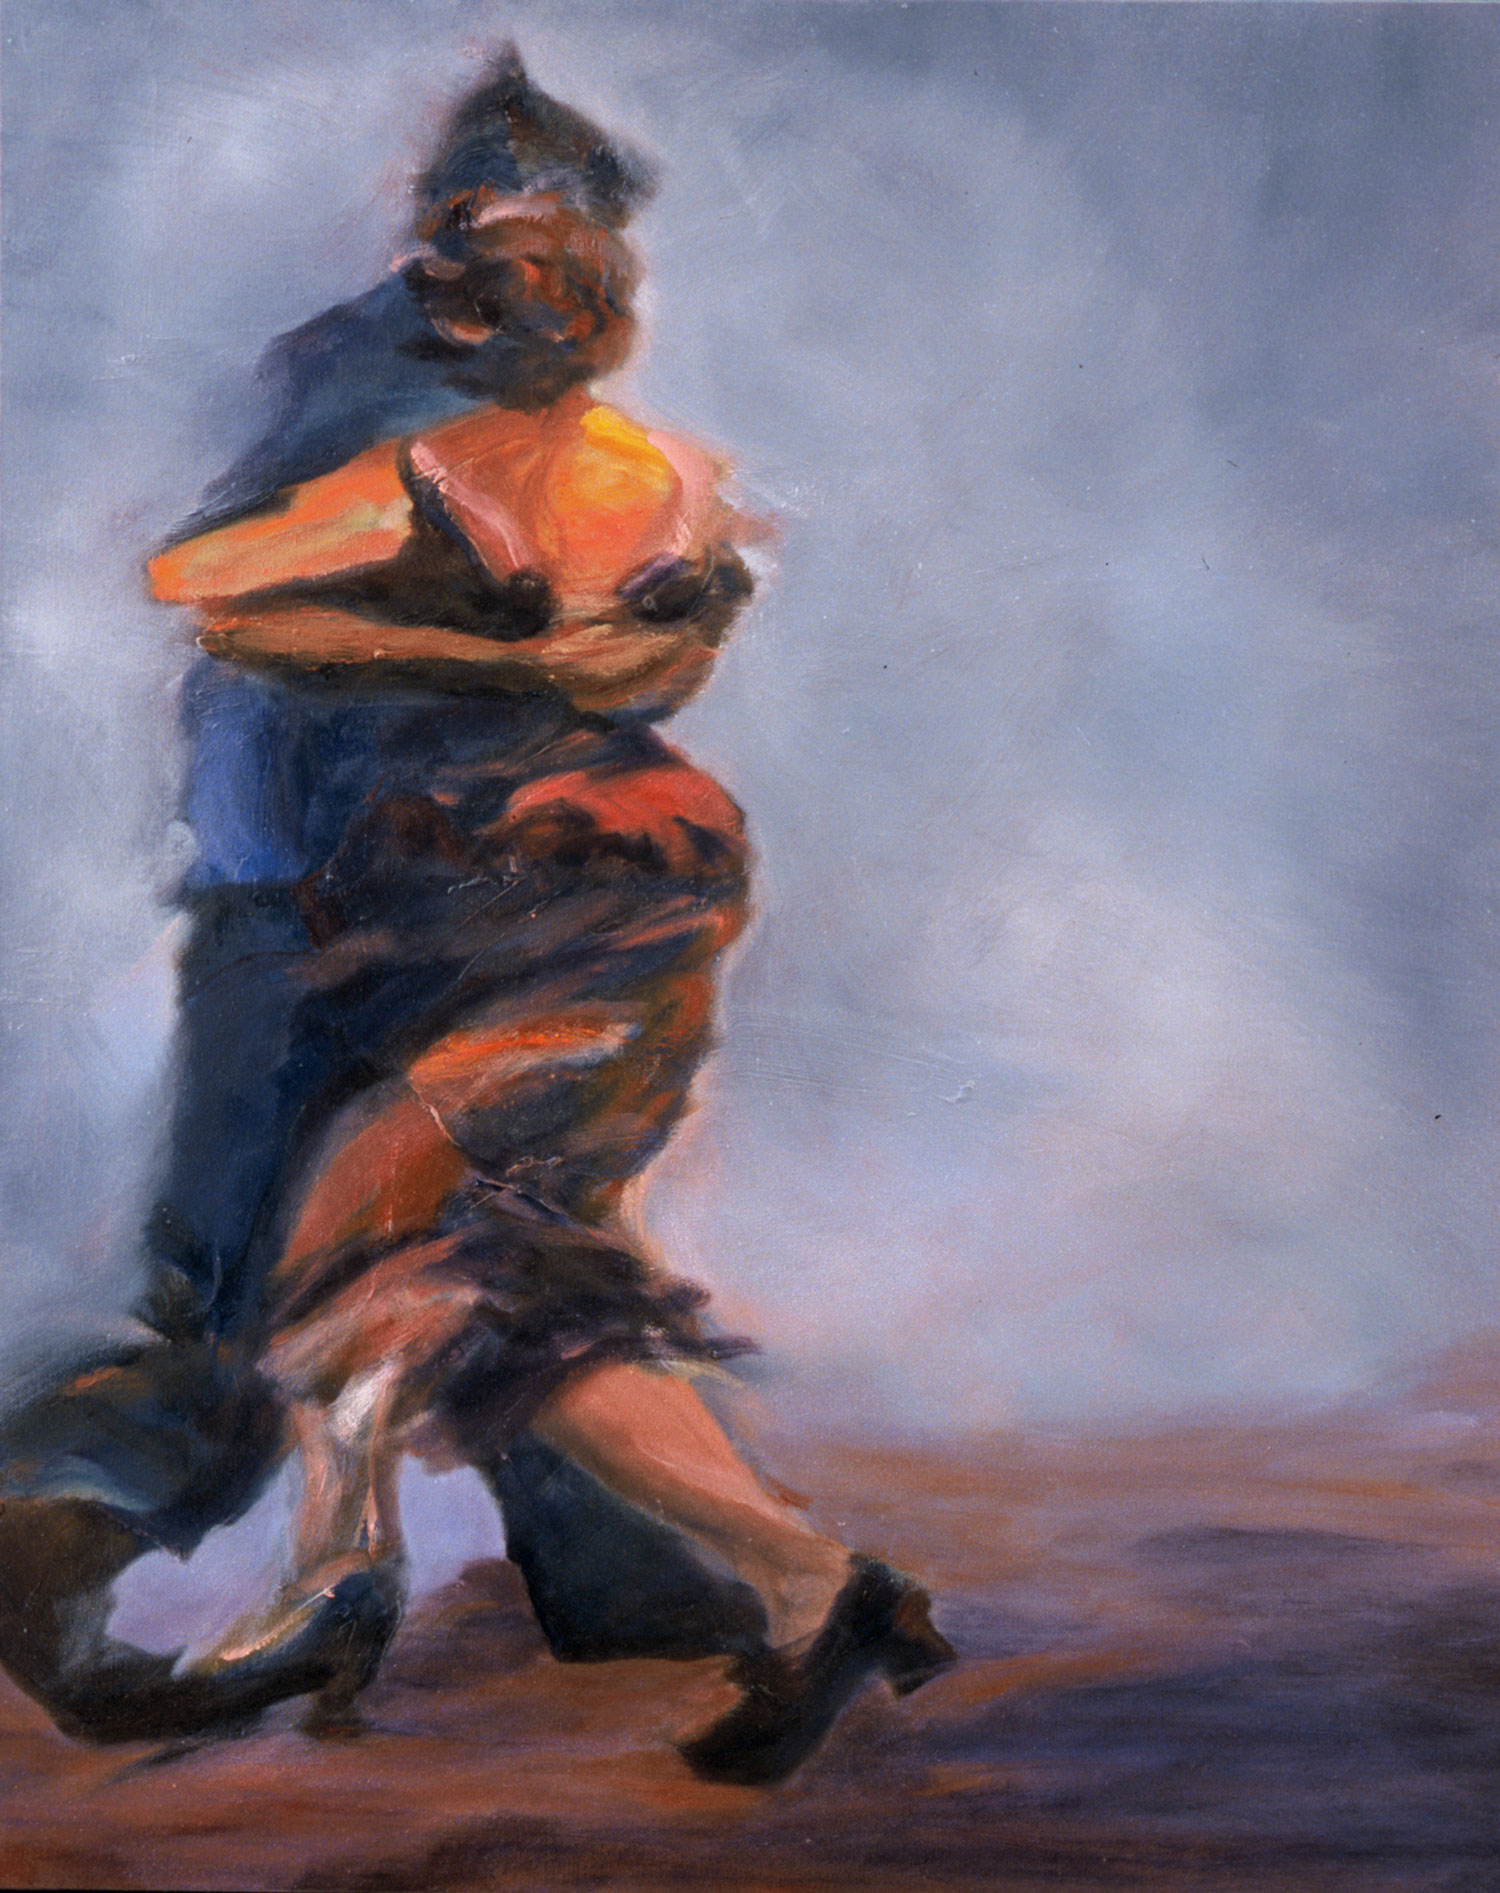 "Azul , 2004, oil canvas, 24 x 30"", SOLD"